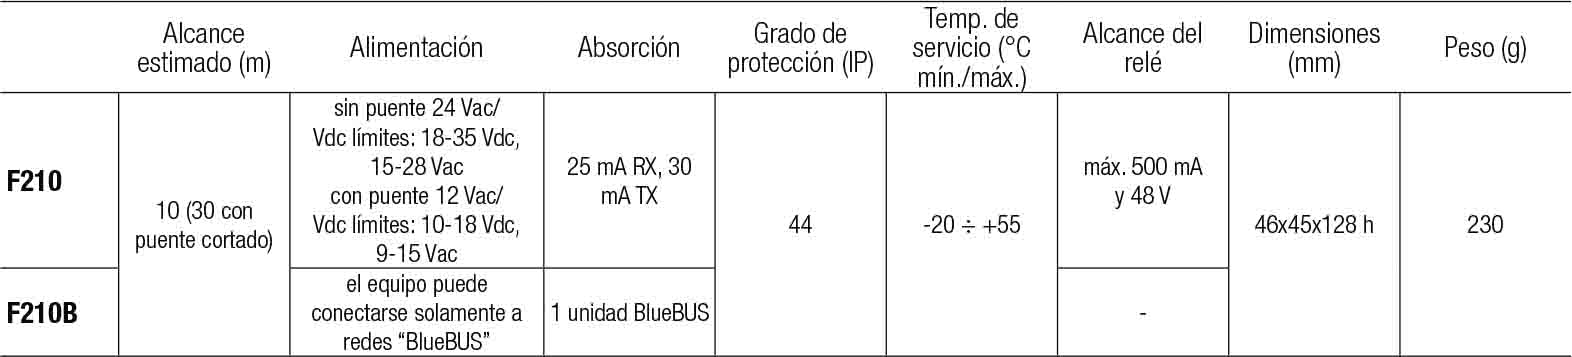 caracteristicas-f210-f210b